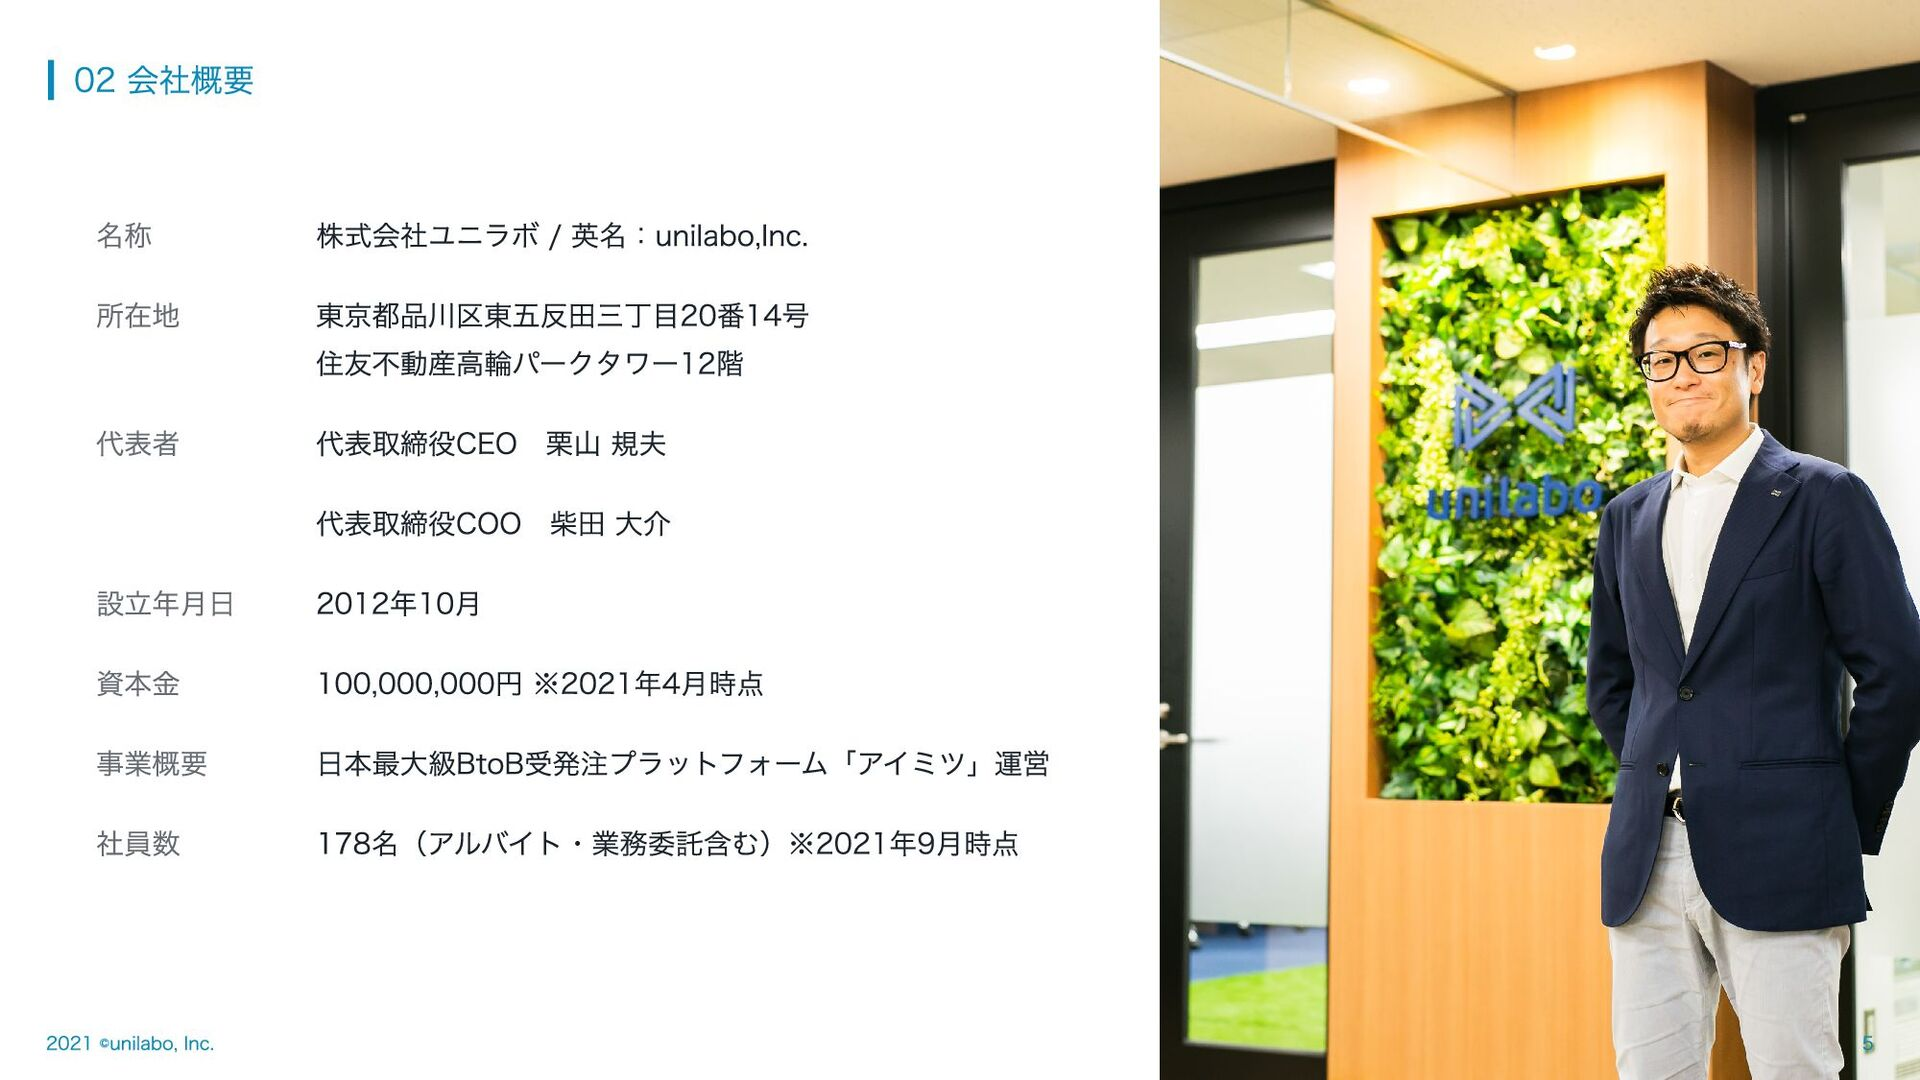 名称 株式会社ユニラボ / 英名:unilabo,Inc.  所在地 東京都品川区東五反...